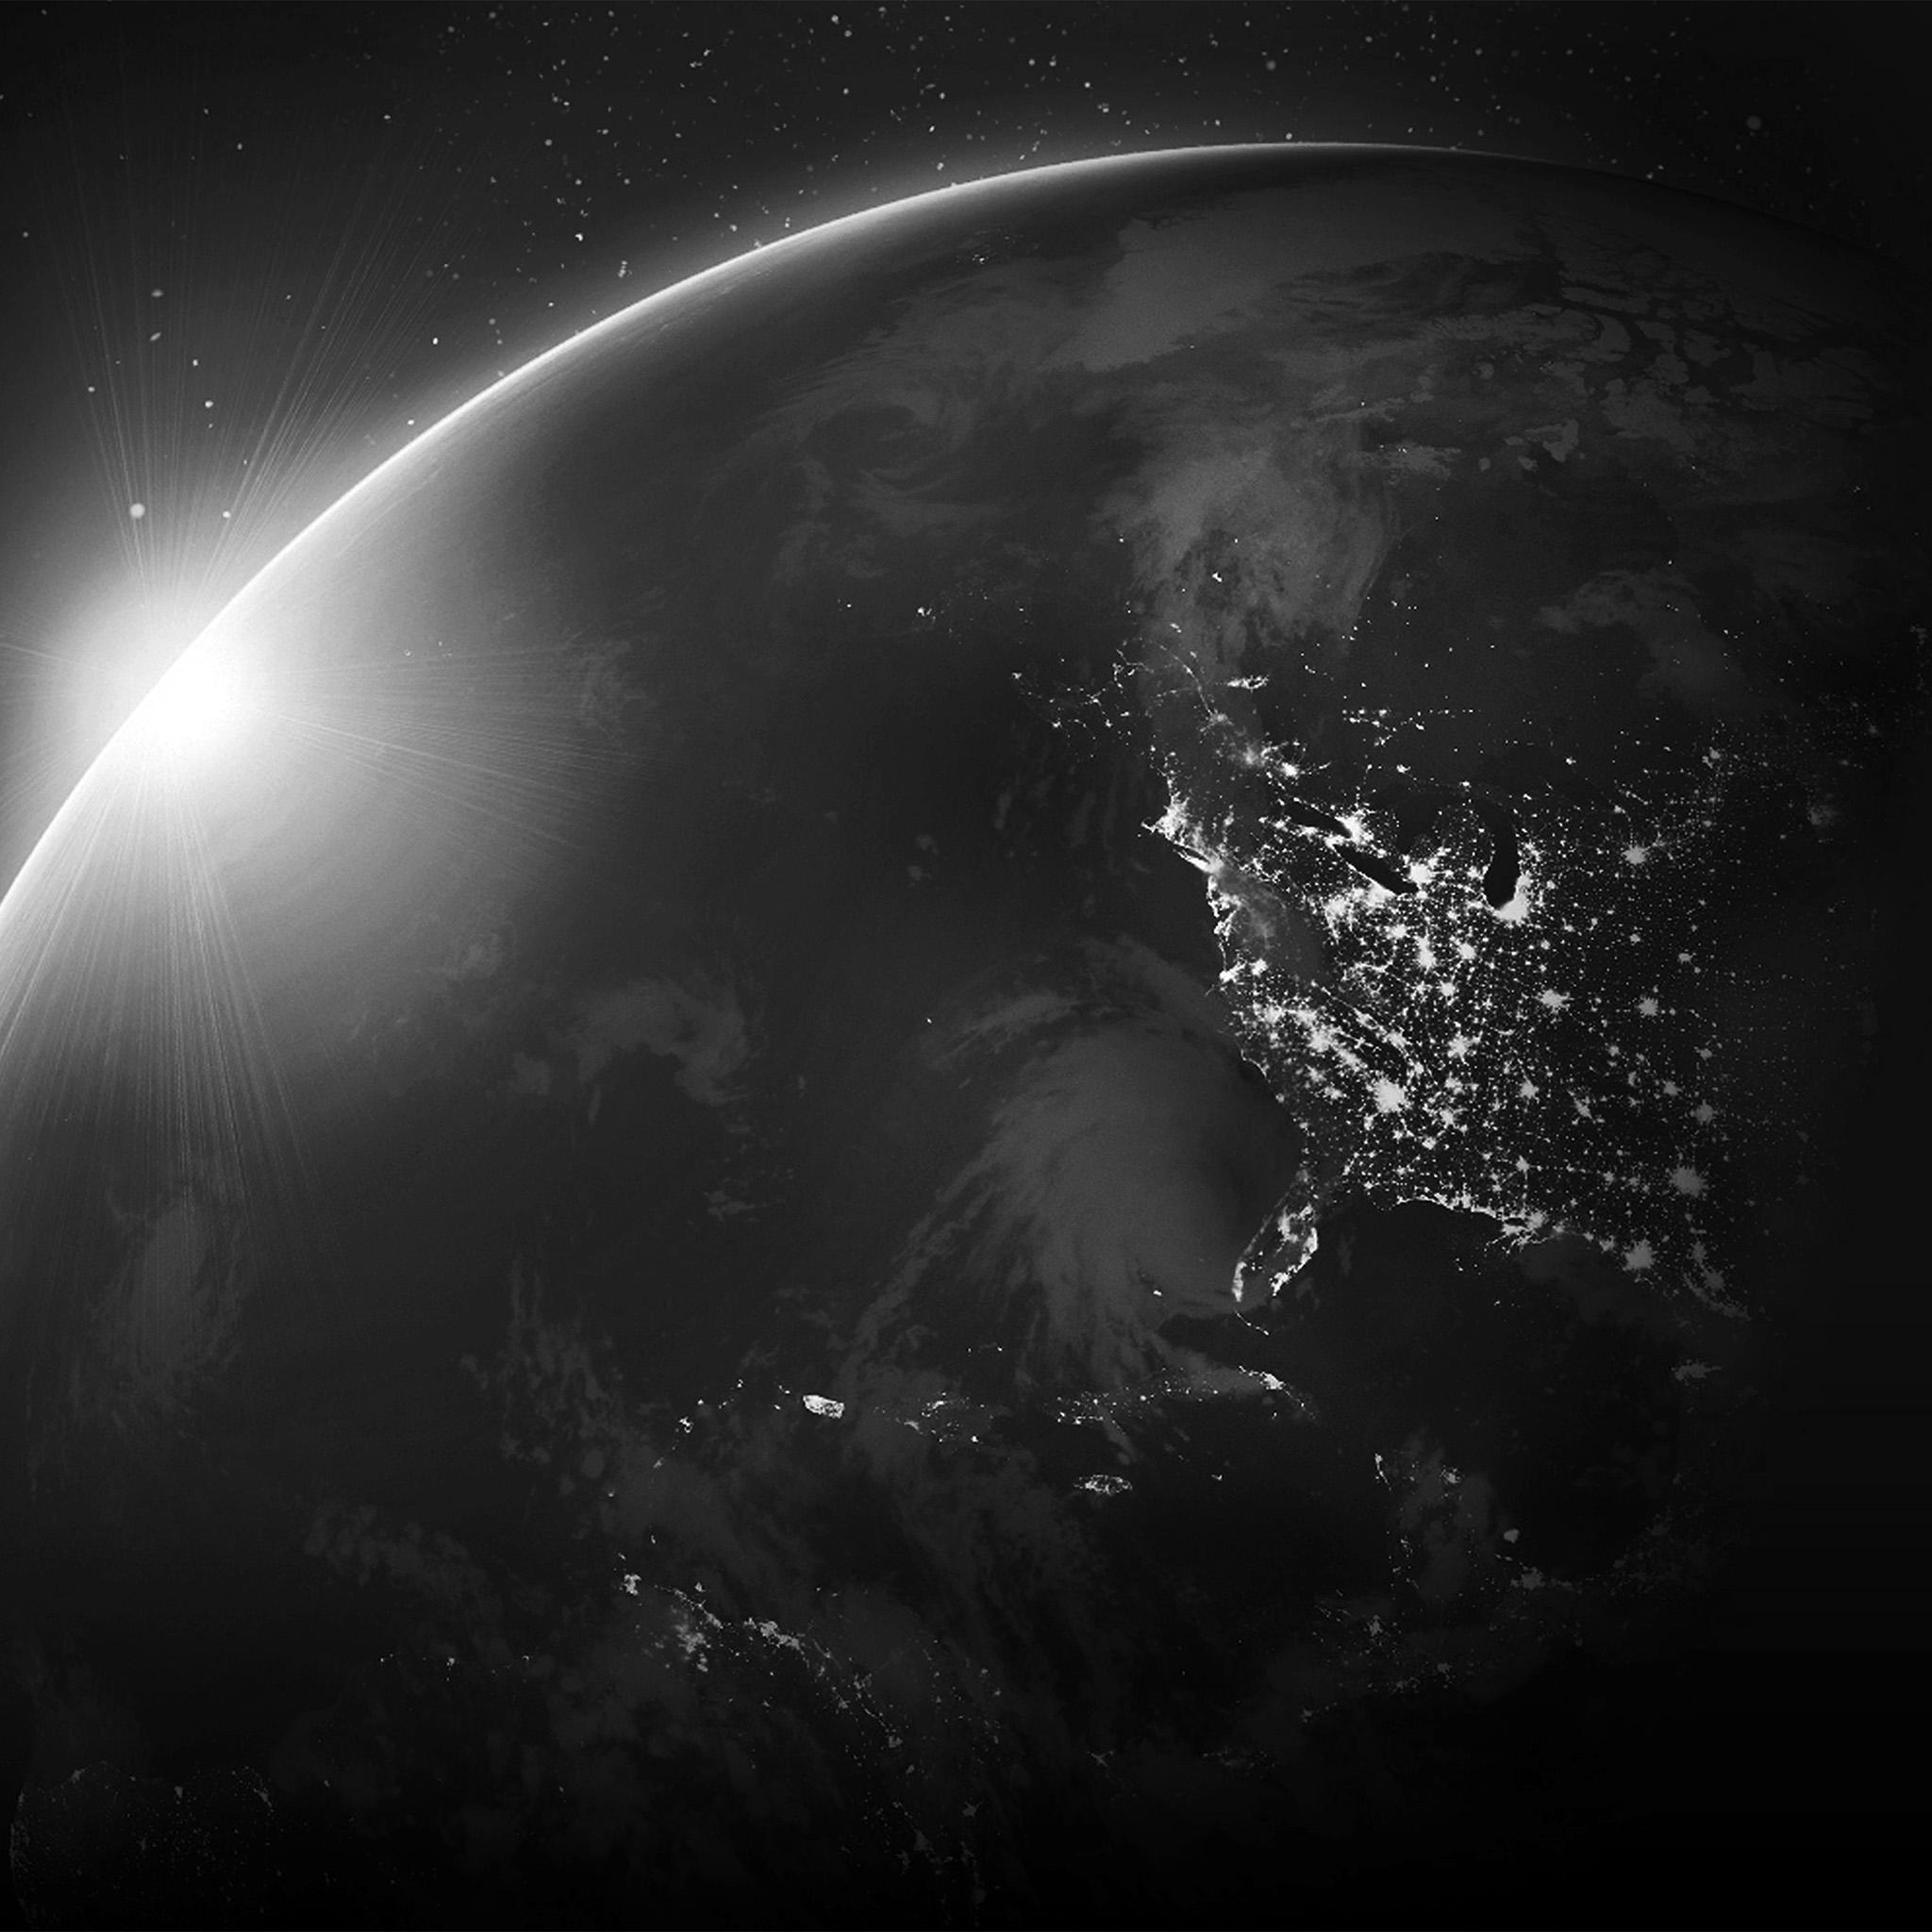 Mt96-space-light-sun-huawei-background-nature-art-dark-bw